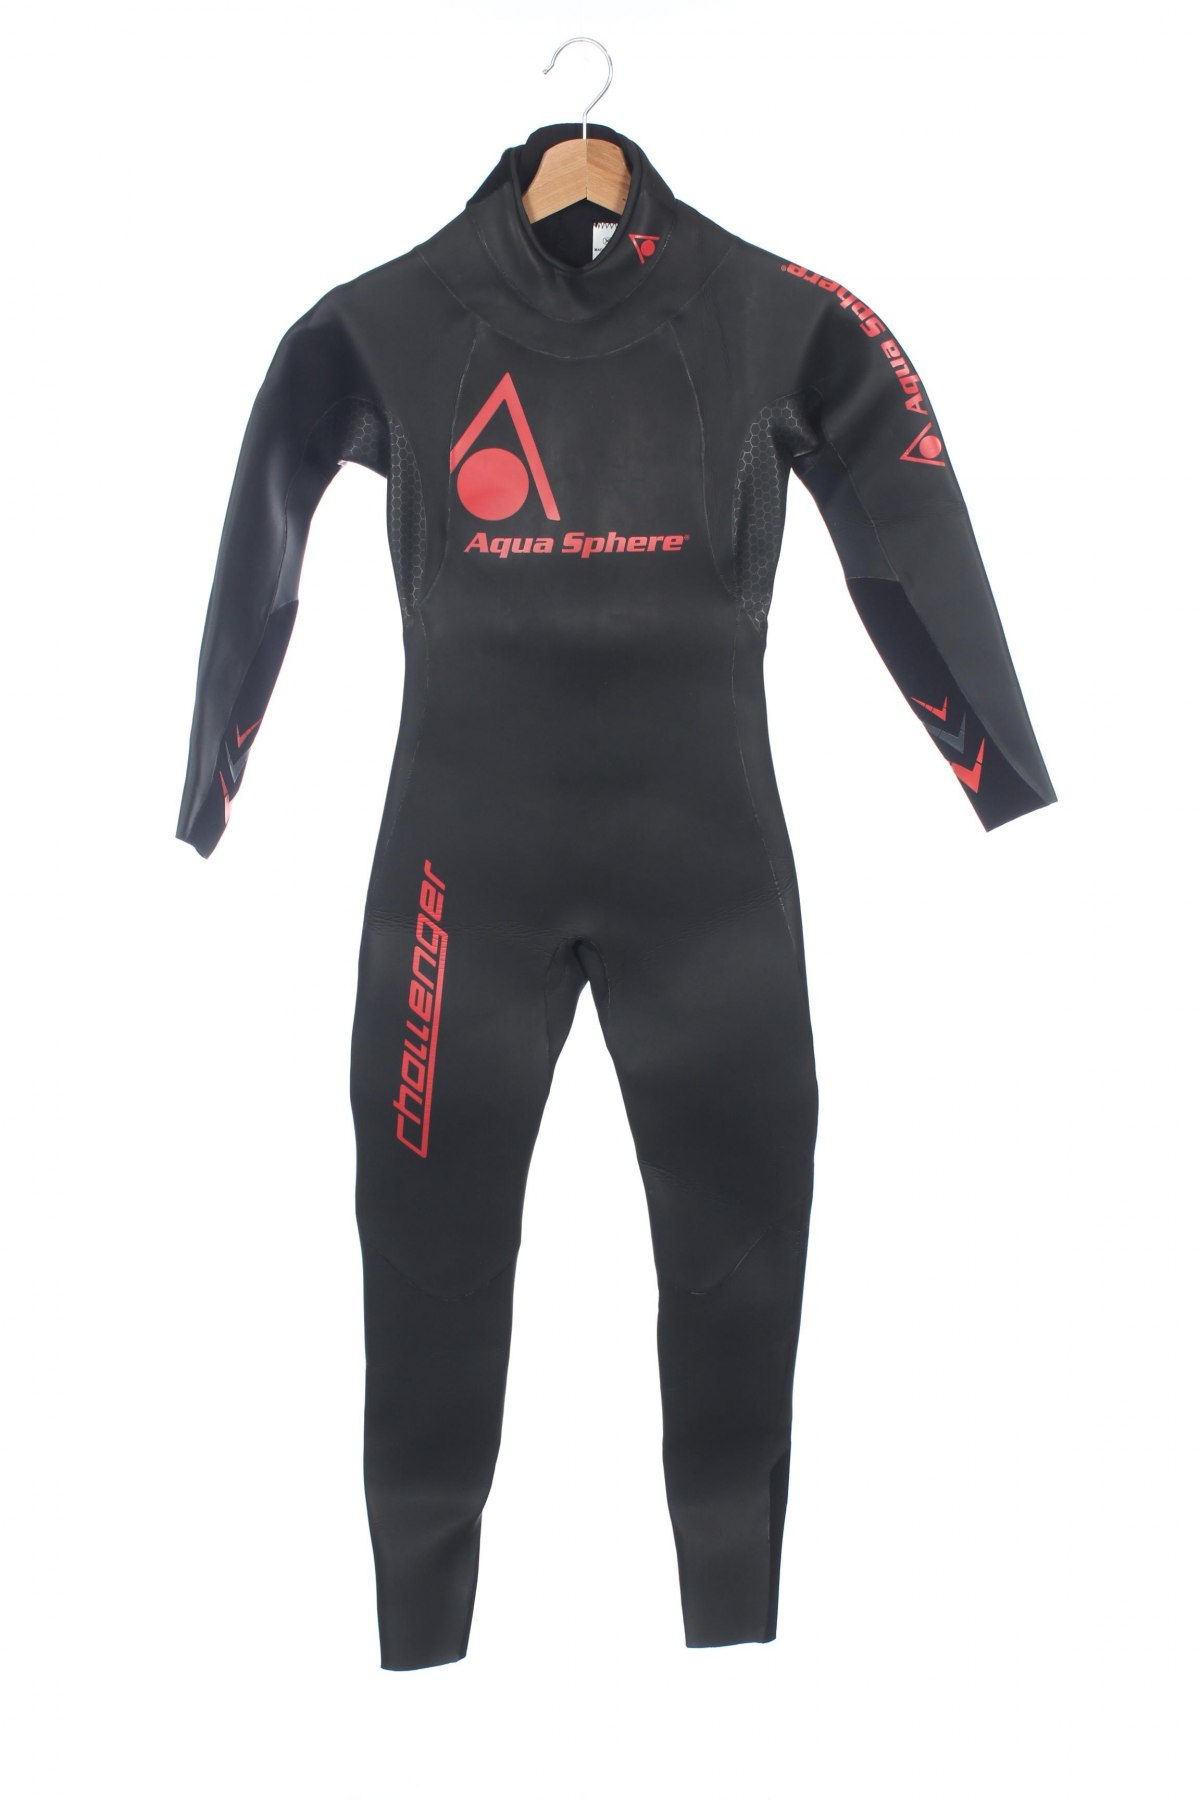 Vízi sportok ruházata Aqua Sphere